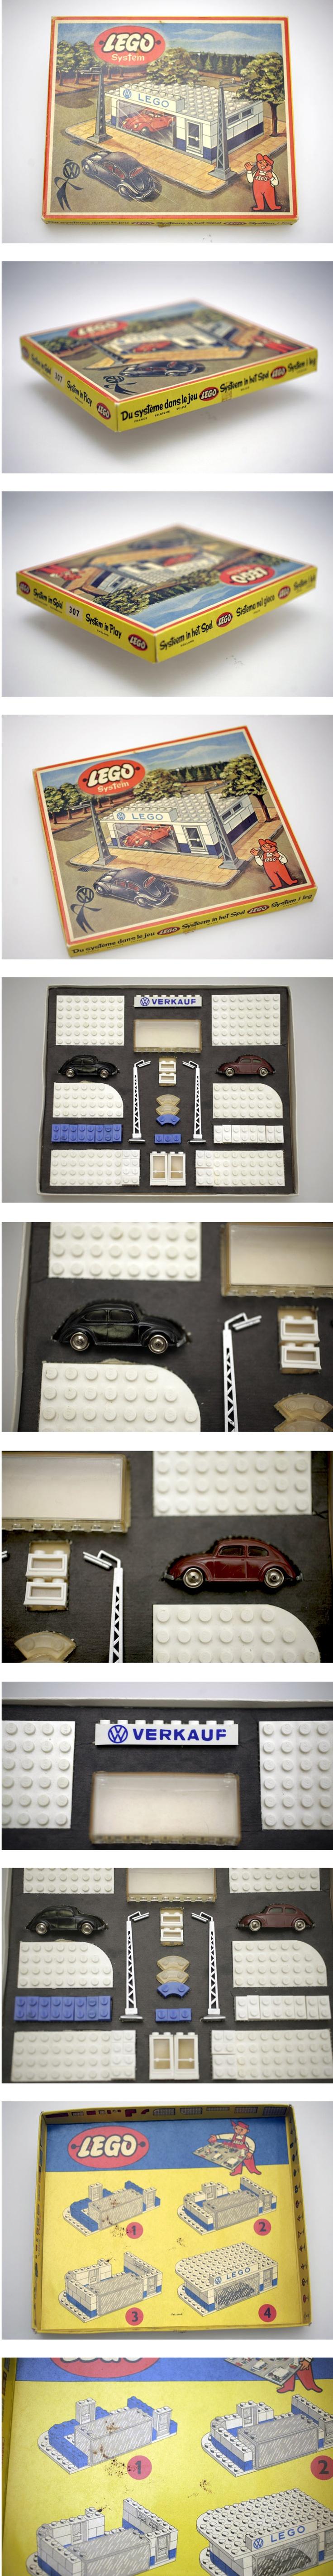 "LEGO SET 307 ""VW VERKAUF"" von 1958 FOR SALE NOW on EBAY.DE  Lego envy"